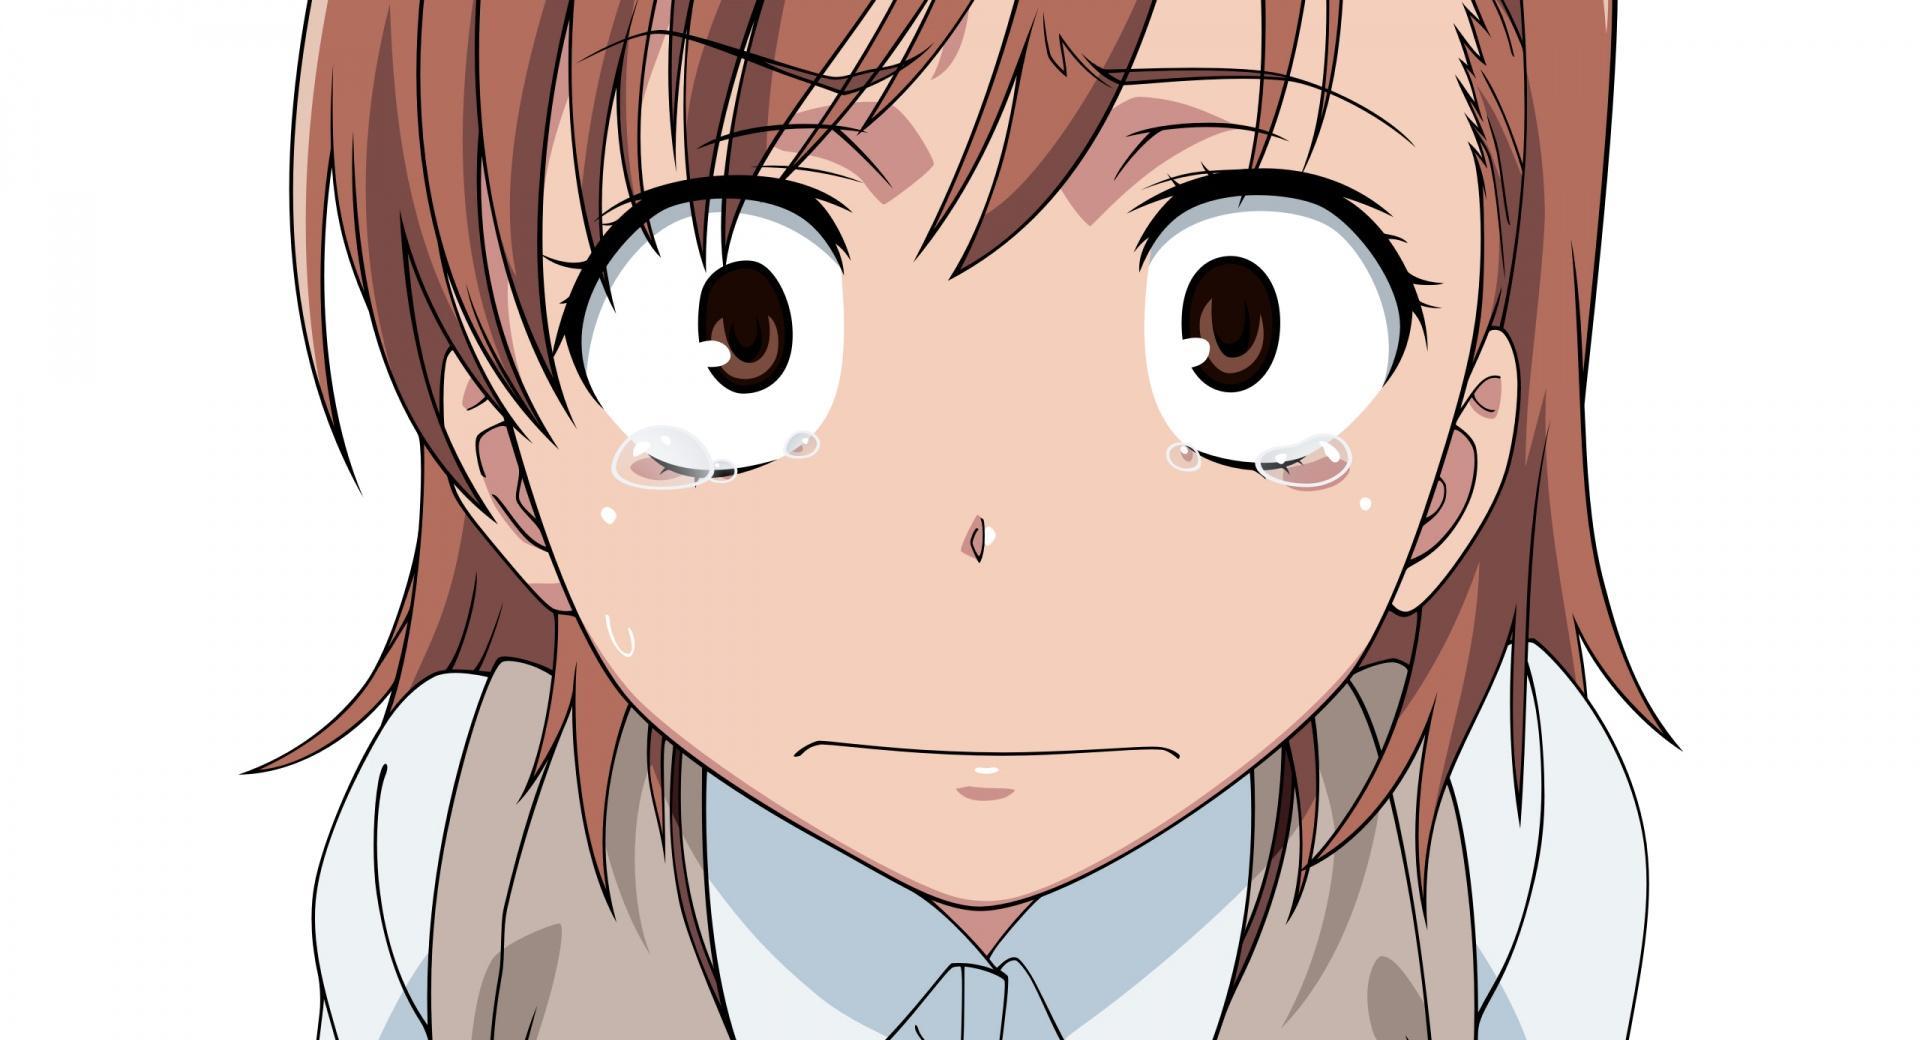 Toaru Majutsu No Index  Misaka Mikoto wallpapers HD quality